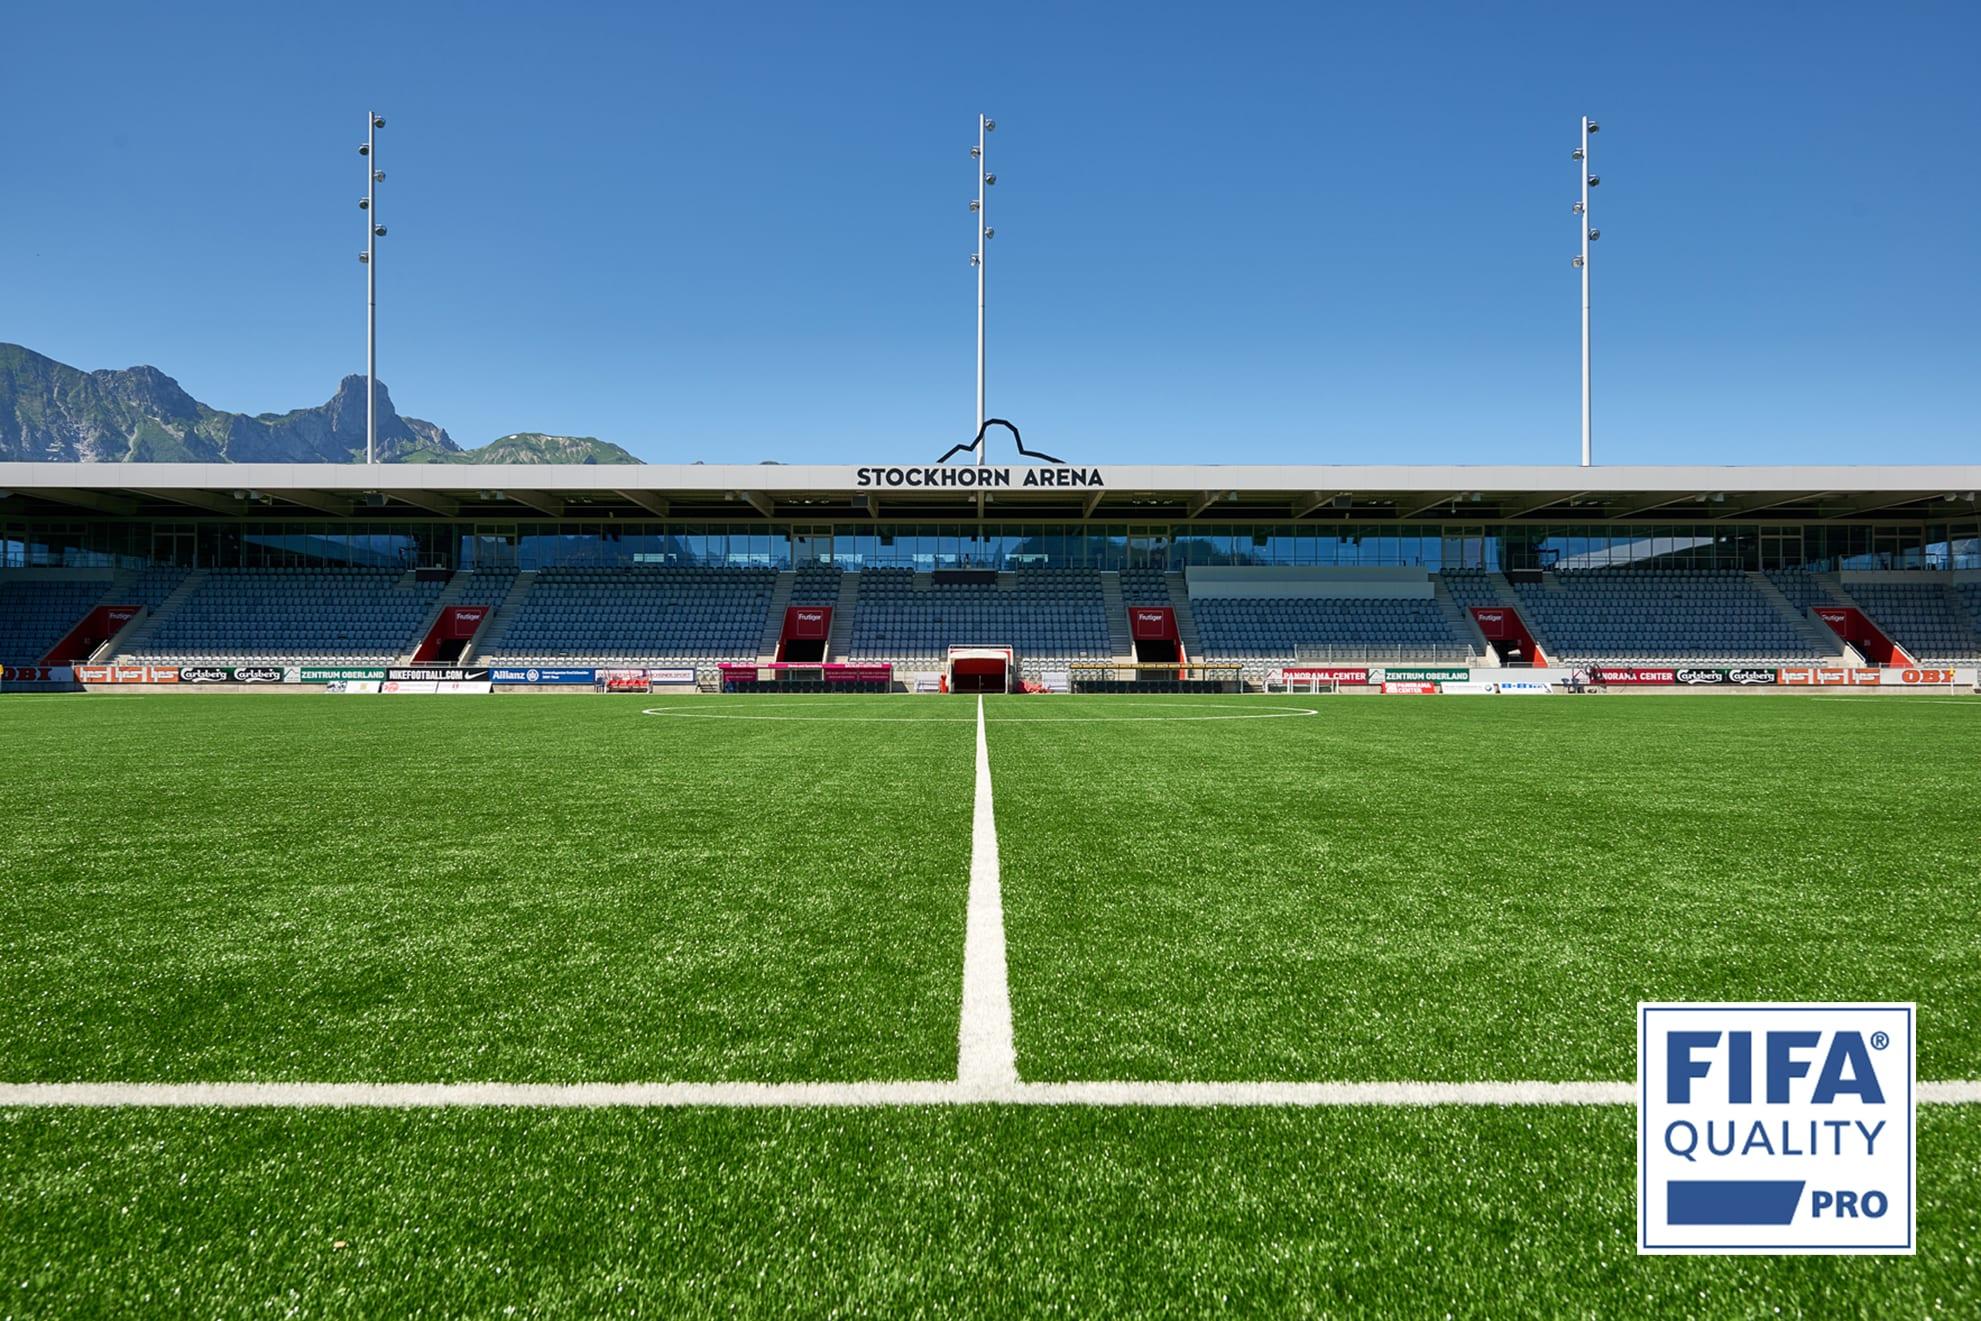 Stockhorn Arena, Schweiz, FIFA Quality Pro